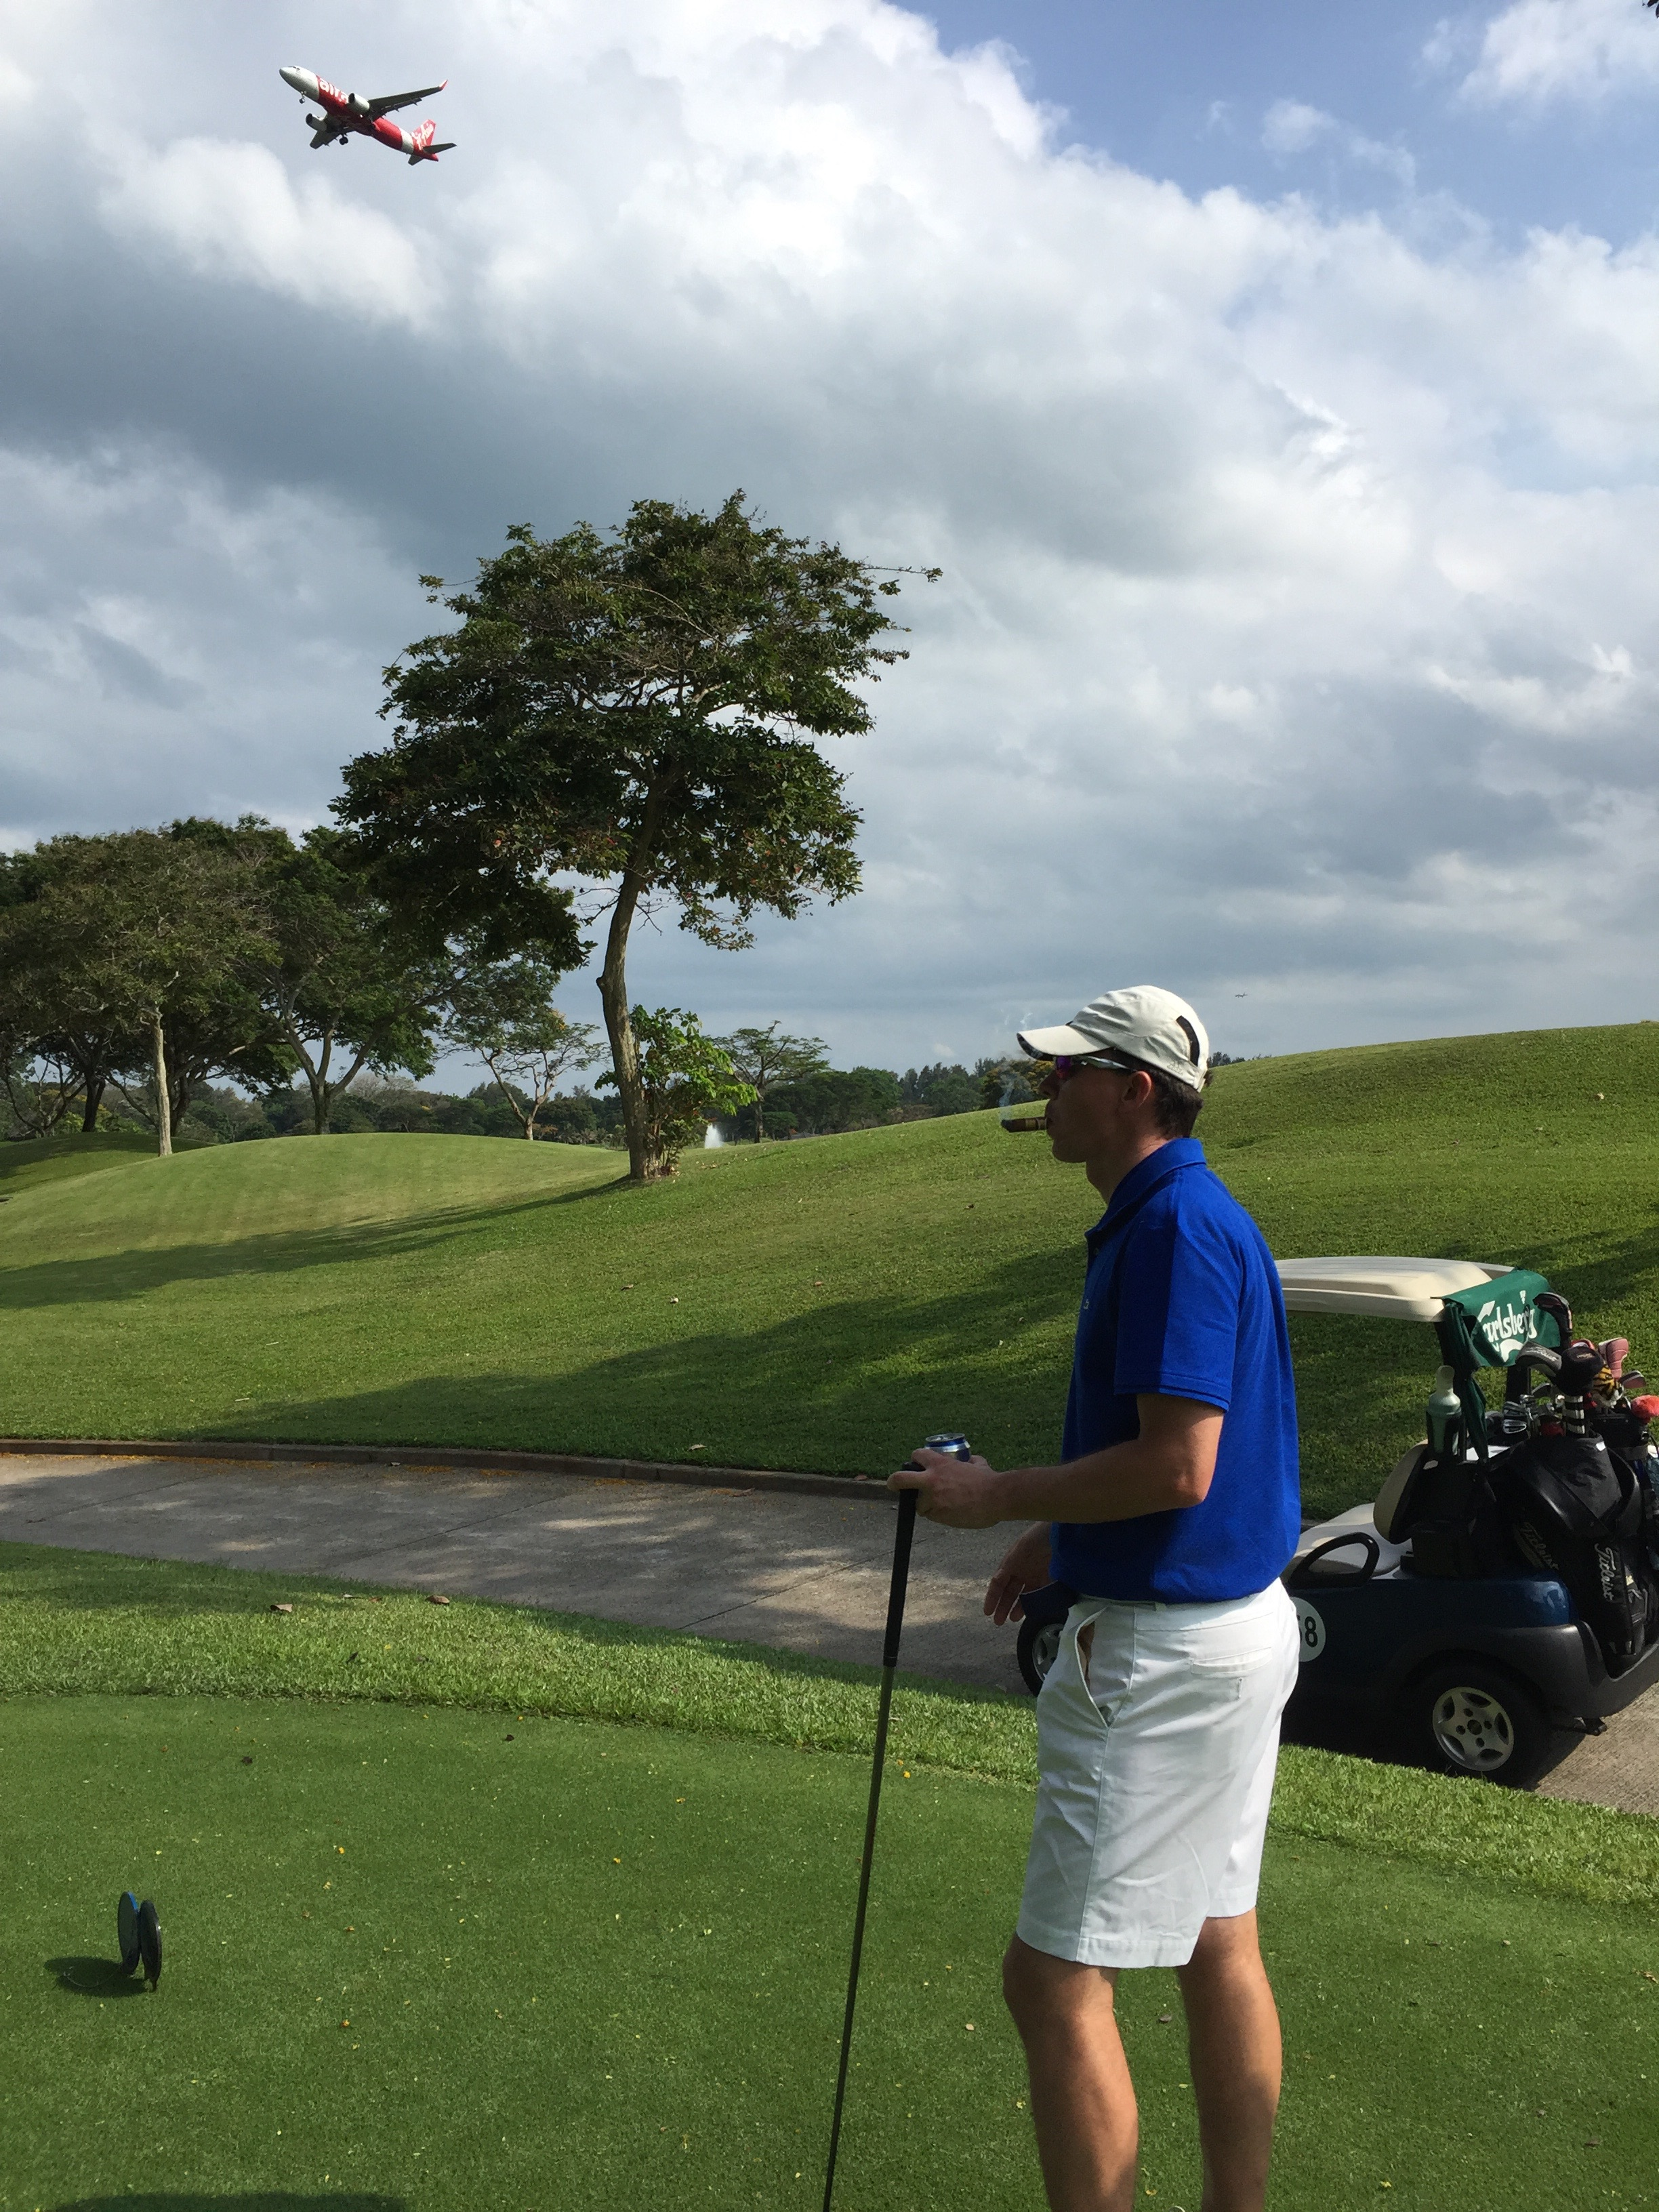 Avatar of golfer named Eric Bissonnier